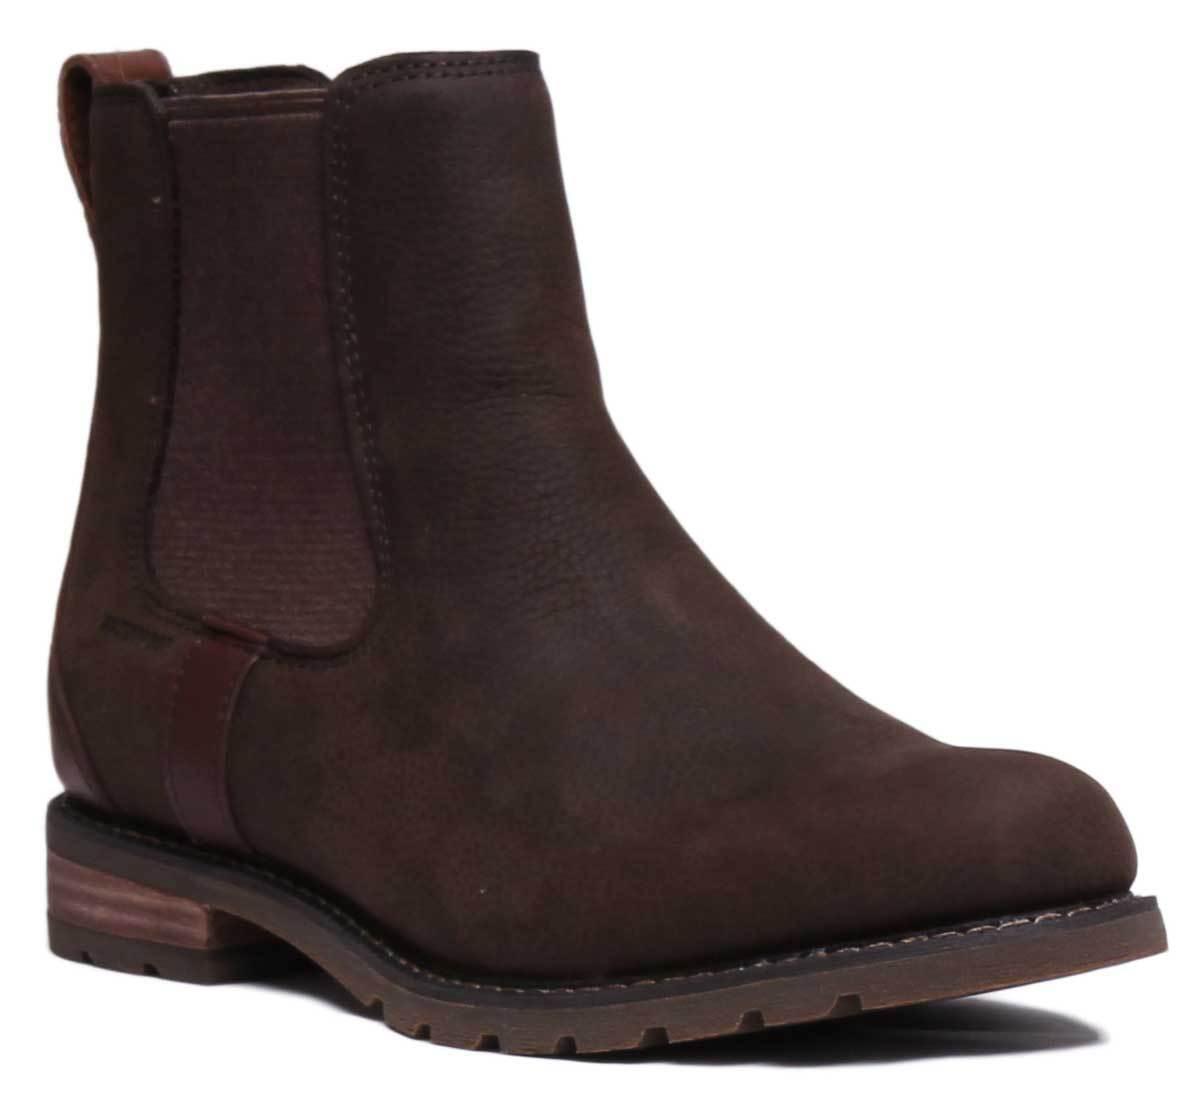 Ariat Wexford H2O damen Leather Khaki Ankle Stiefel UK Größe 3 - 8